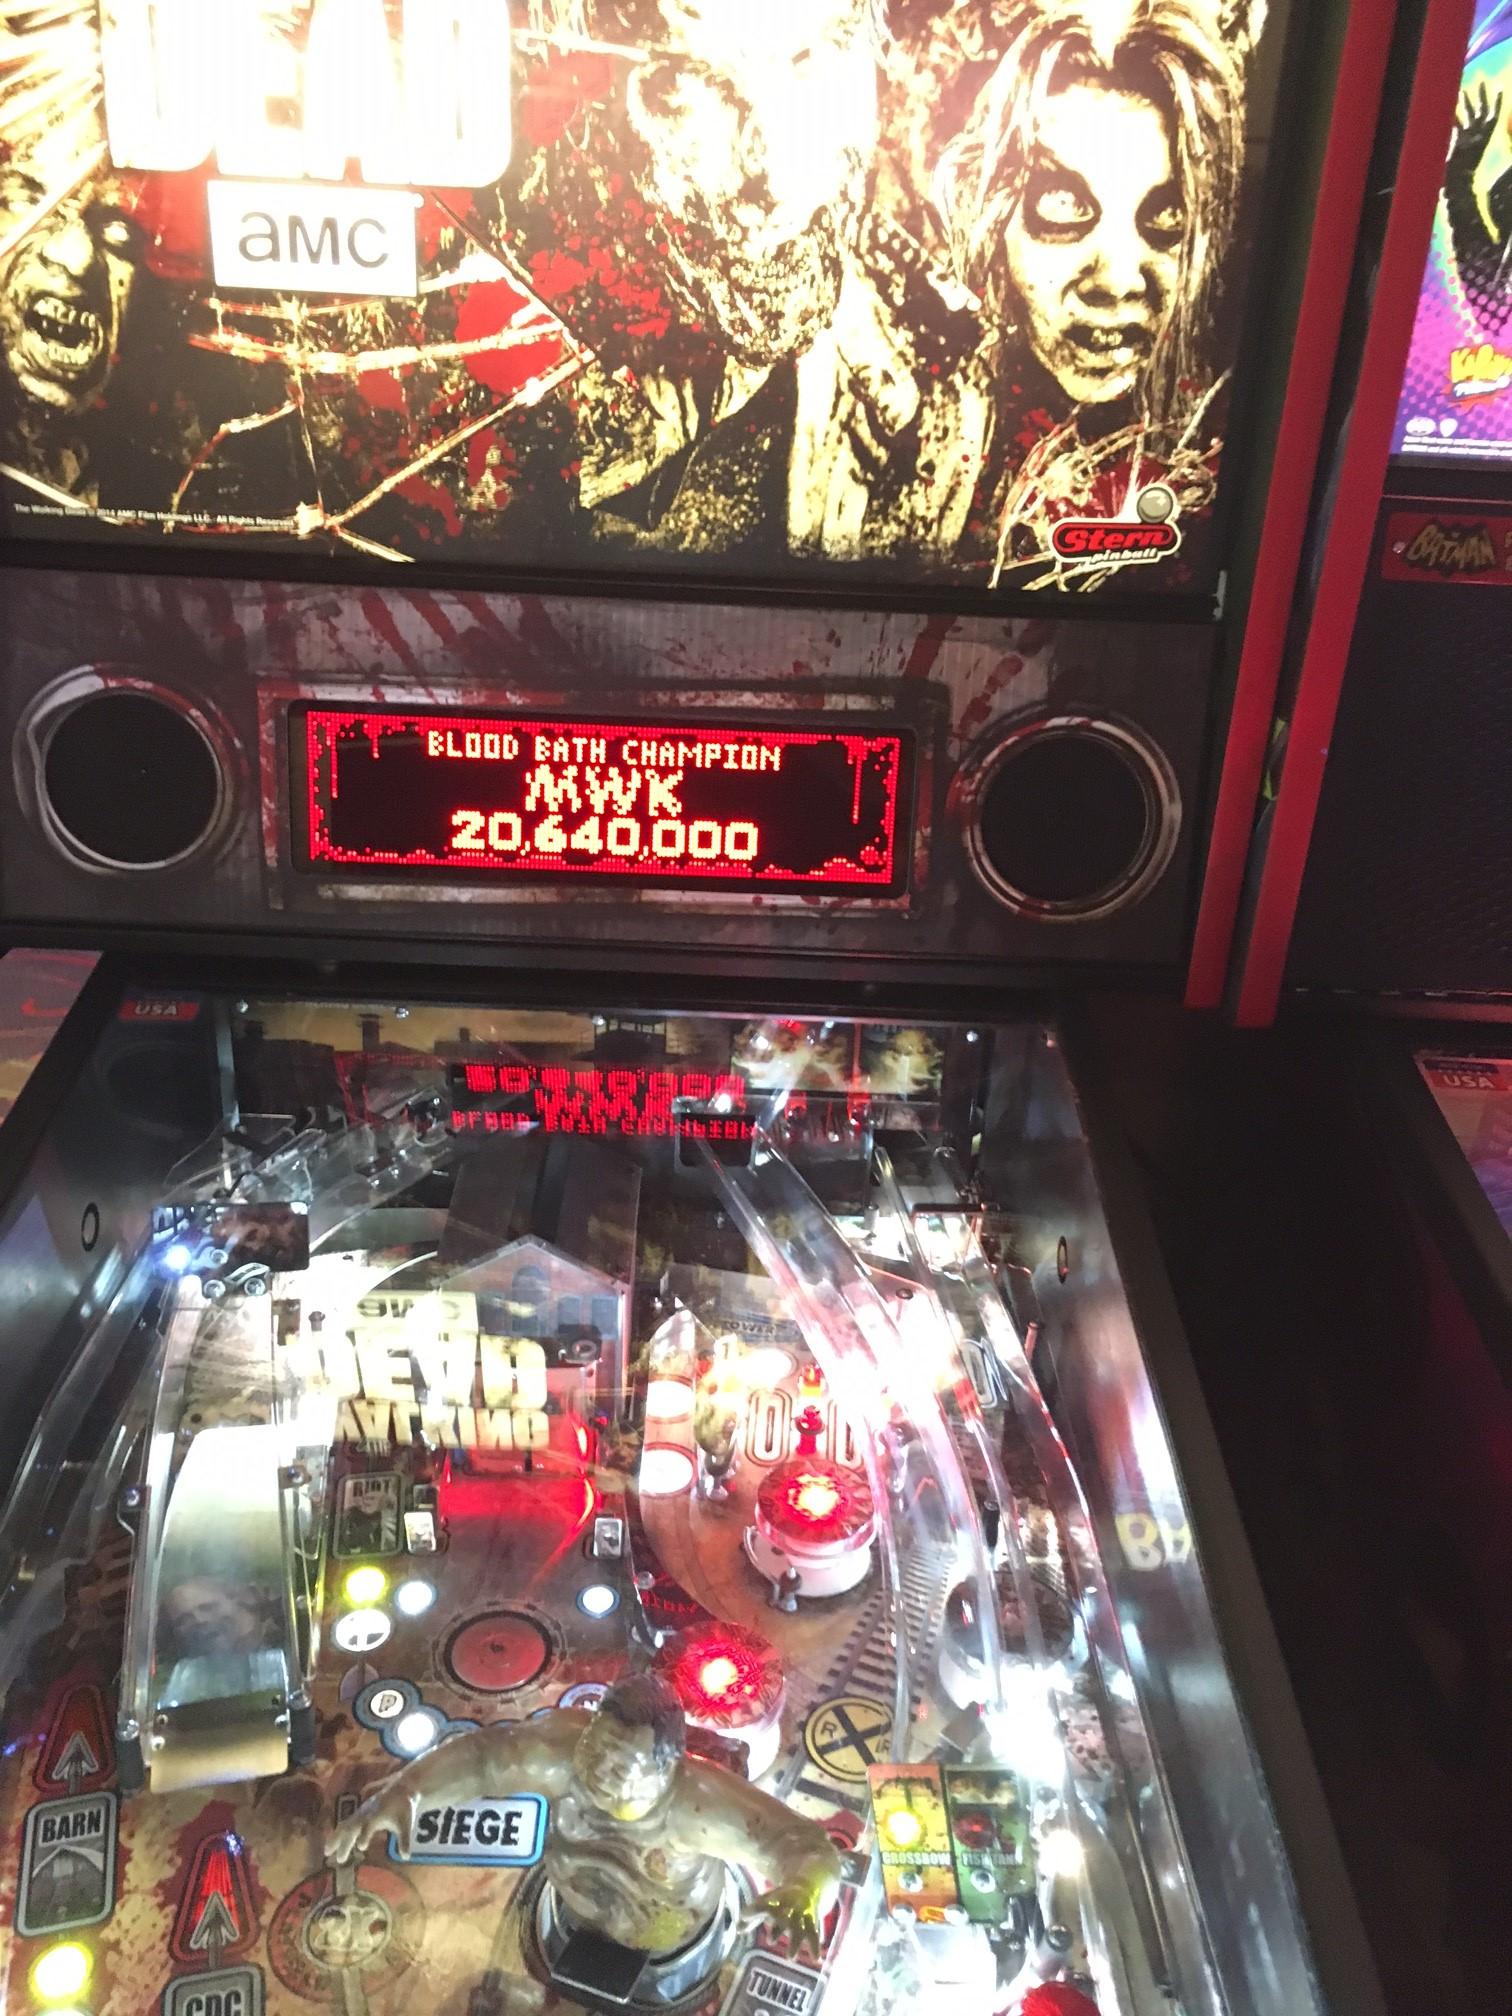 euphonium: The Walking Dead: Blood Bath Champion (Pinball Bonus Mode) 20,640,000 points on 2018-02-14 00:14:41